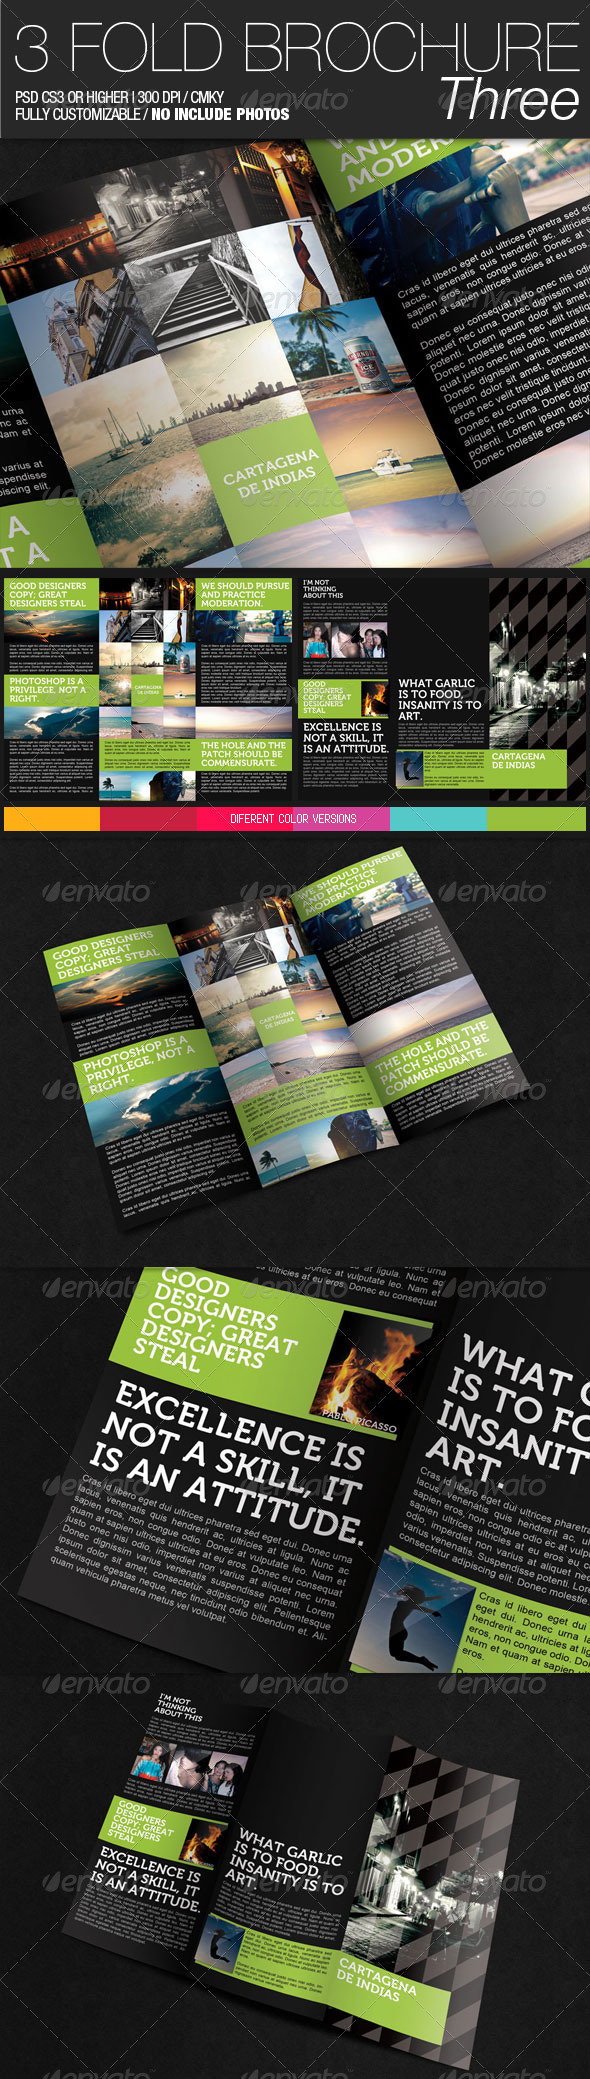 GraphicRiver 3 Fold Brochure III 400369